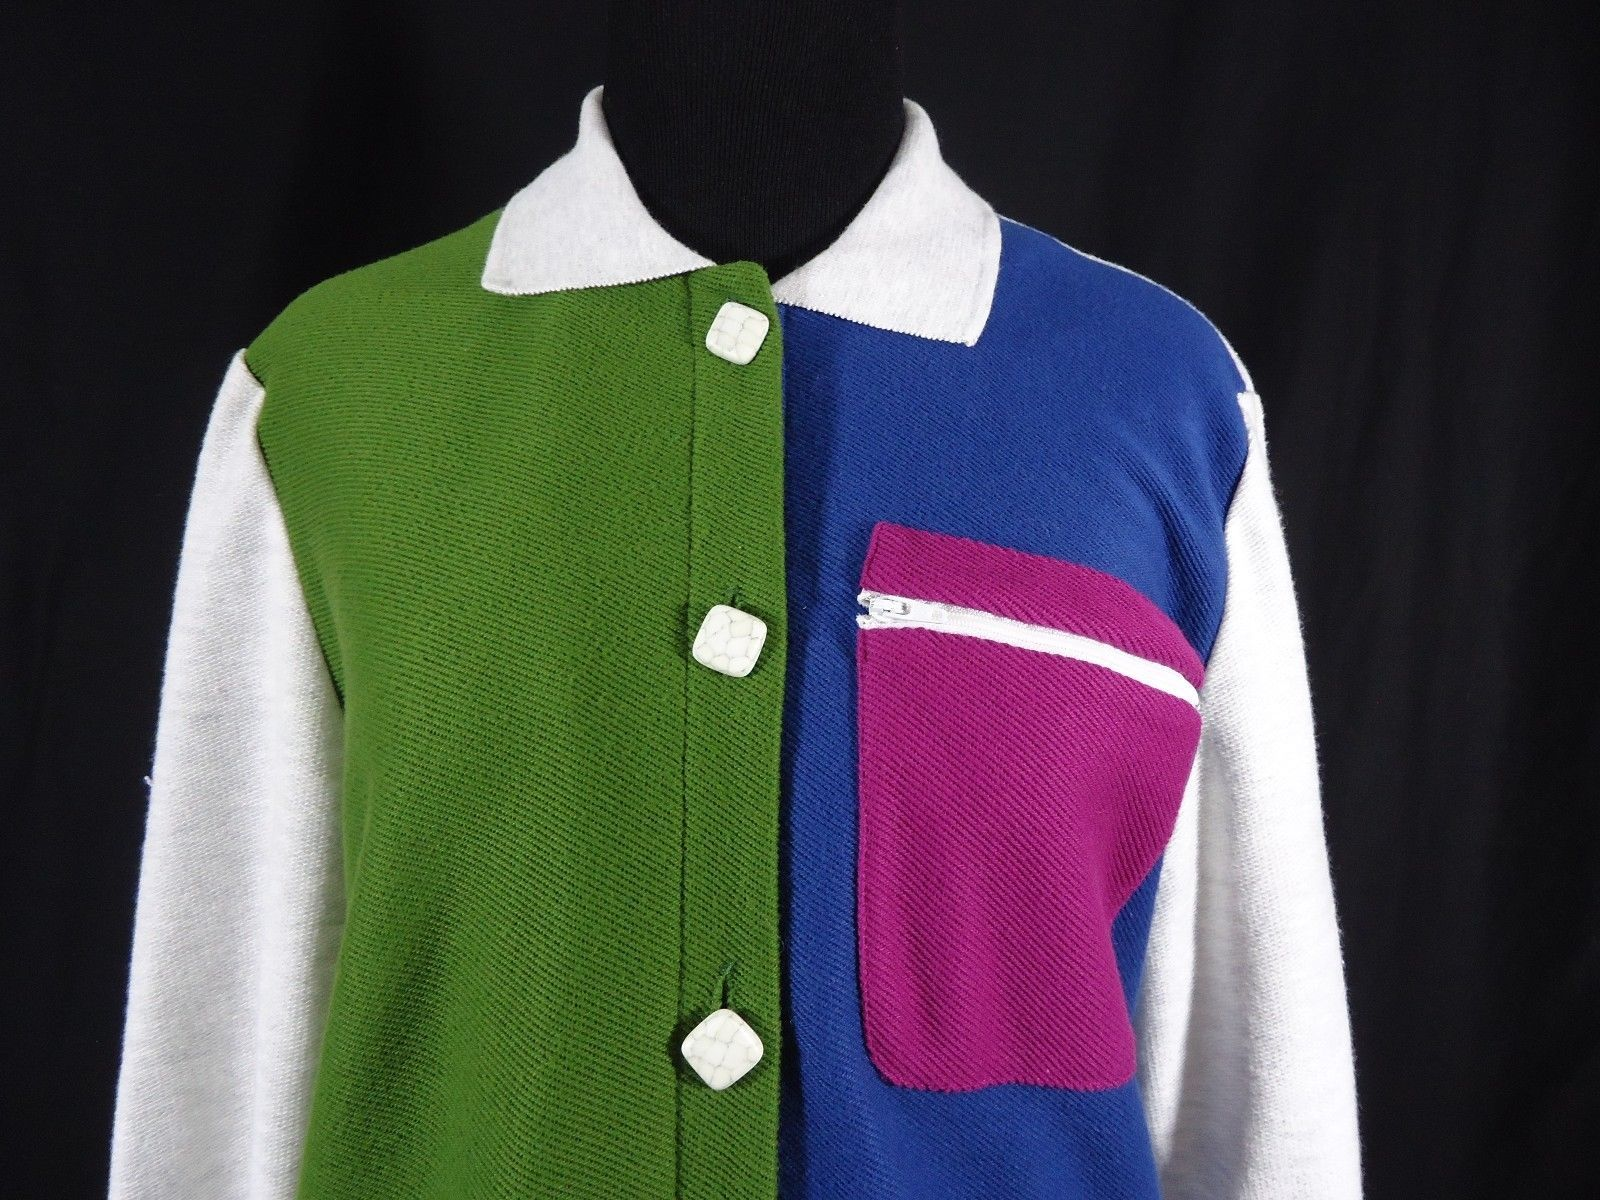 Vintage Peter Popovitch 80's-90's Style Button Down Jacket Multi-Color Blocks